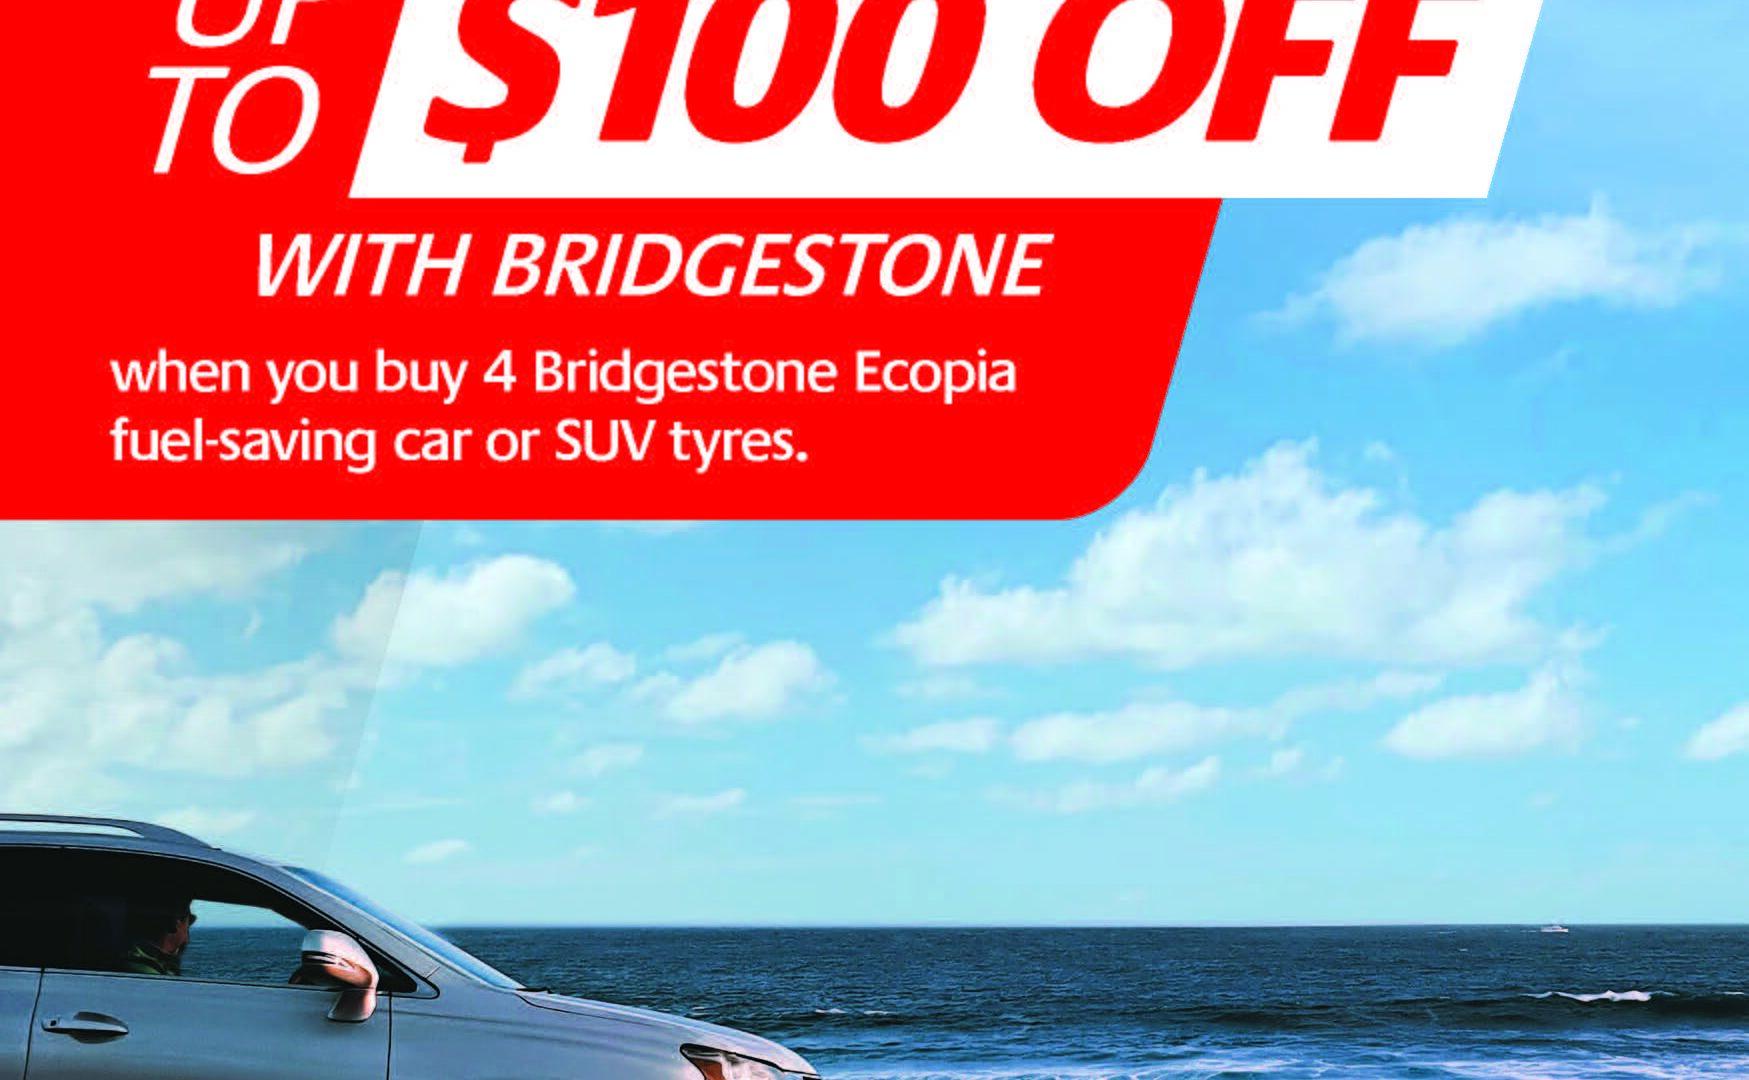 Bridgestone-January-2021-Promotinal-Flyer_Page_1